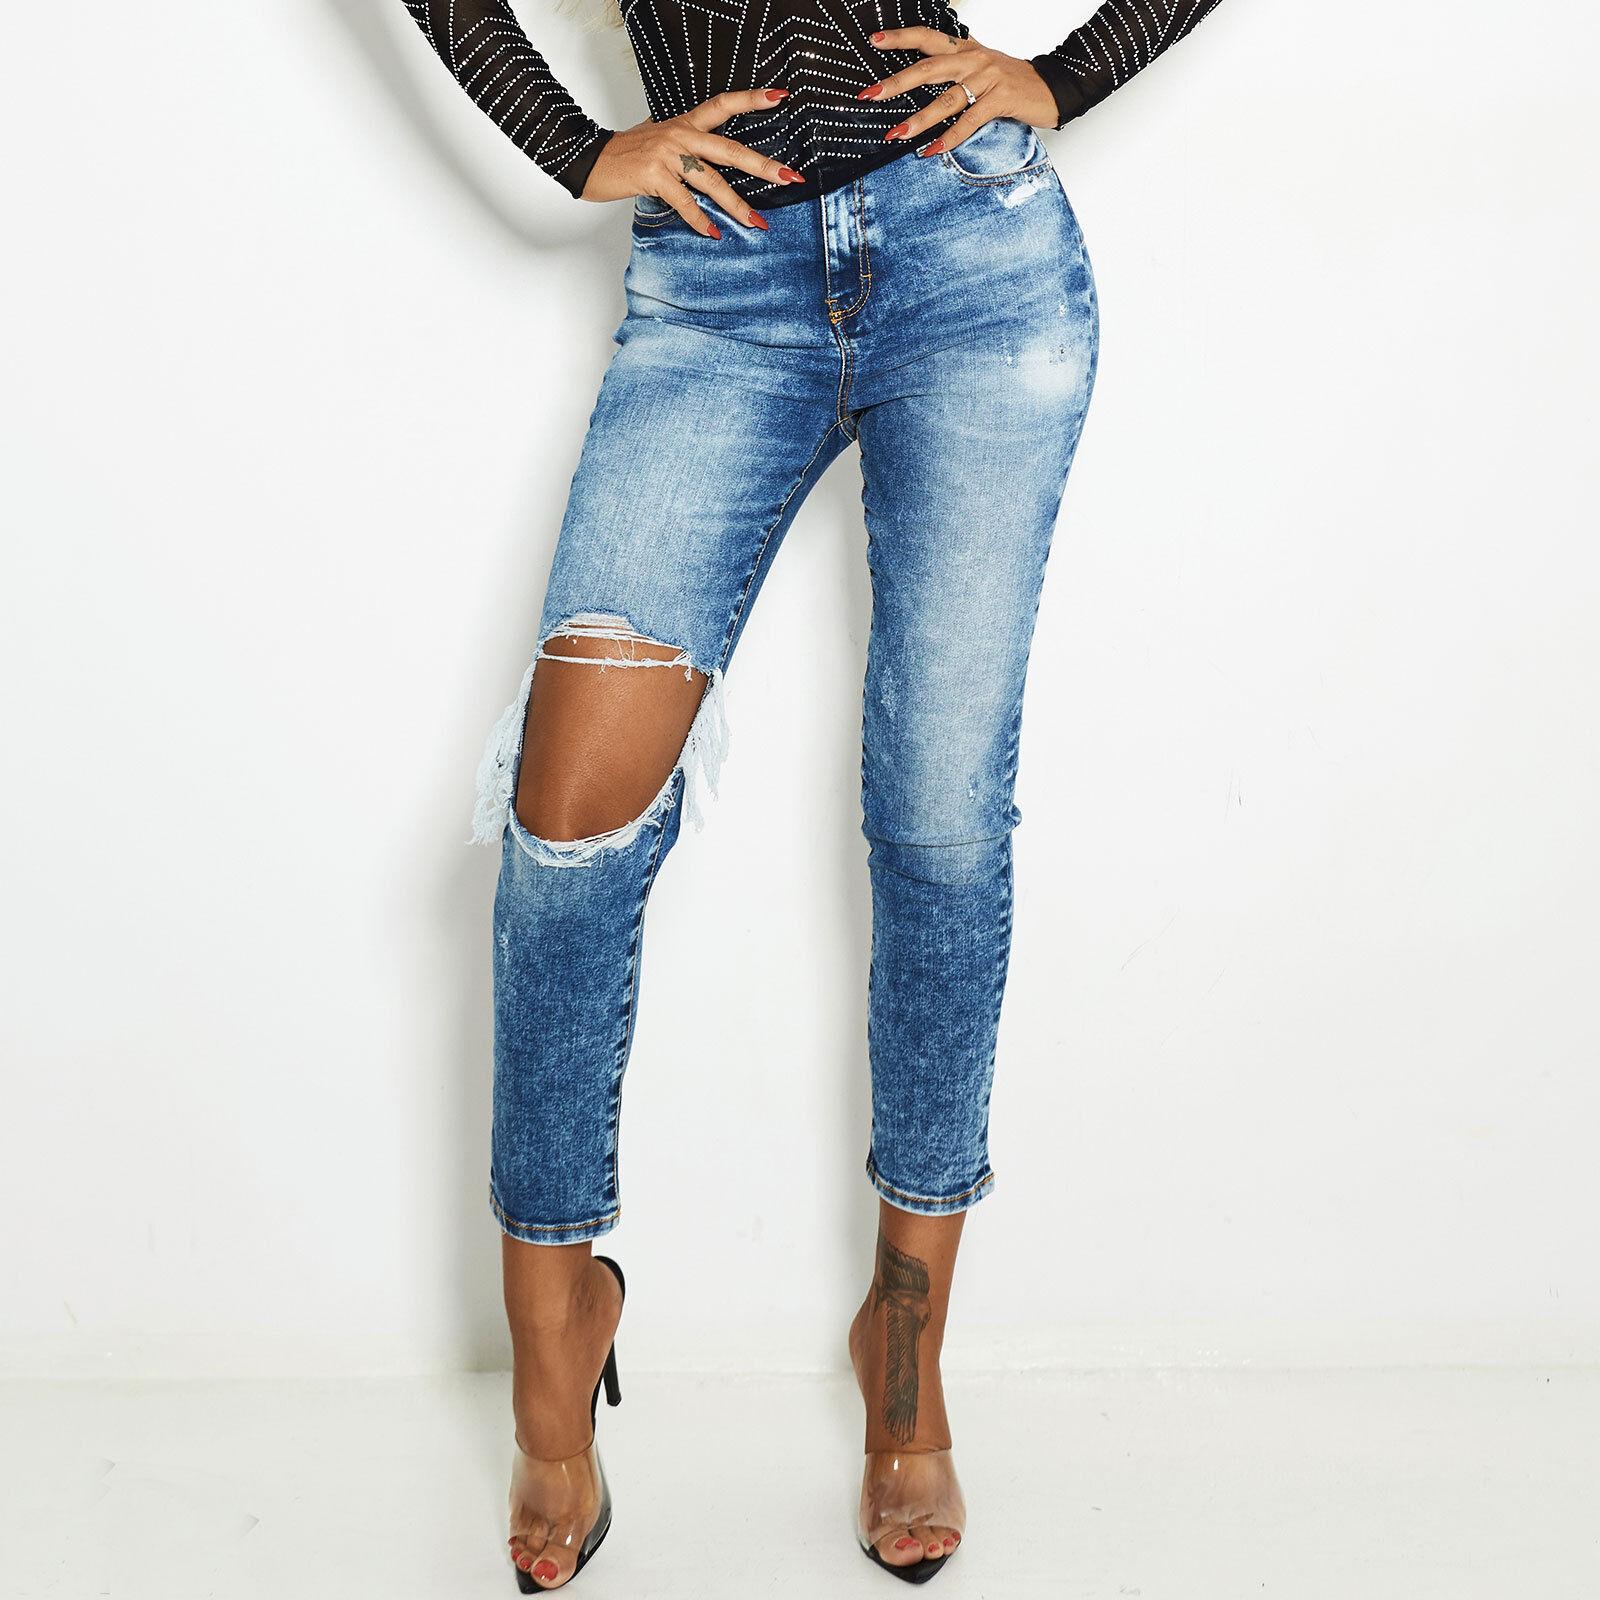 By Alina Damenhose Röhrenhose HIGH-WAIST Boyfriend 7 8 Jeans Hose Blau XS S M